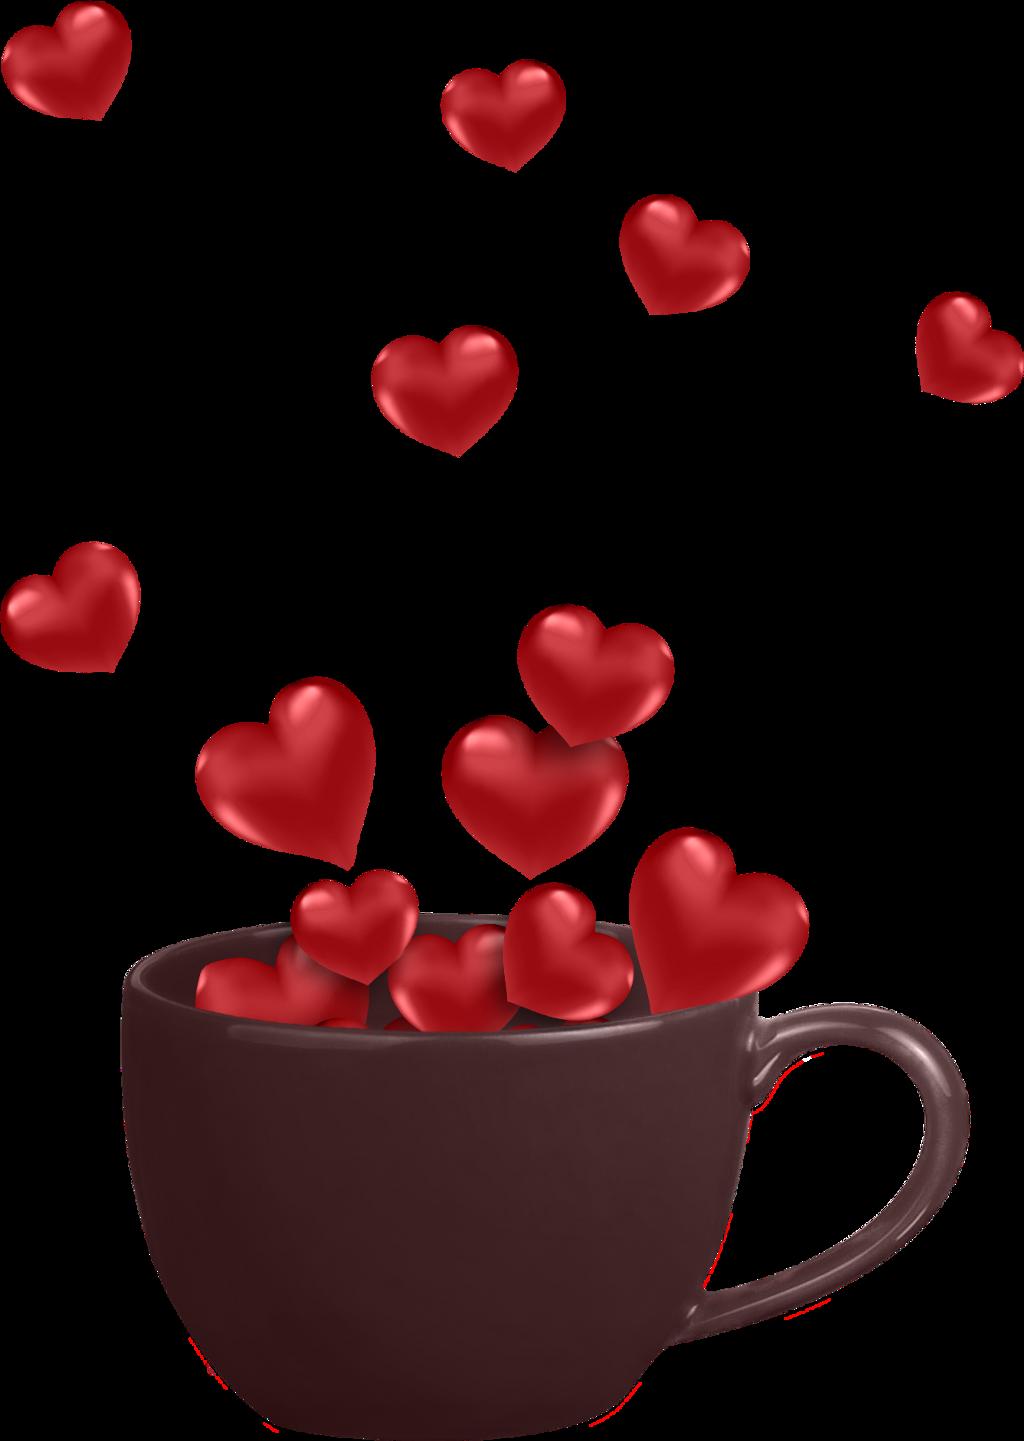 #amor #love #freetoedit